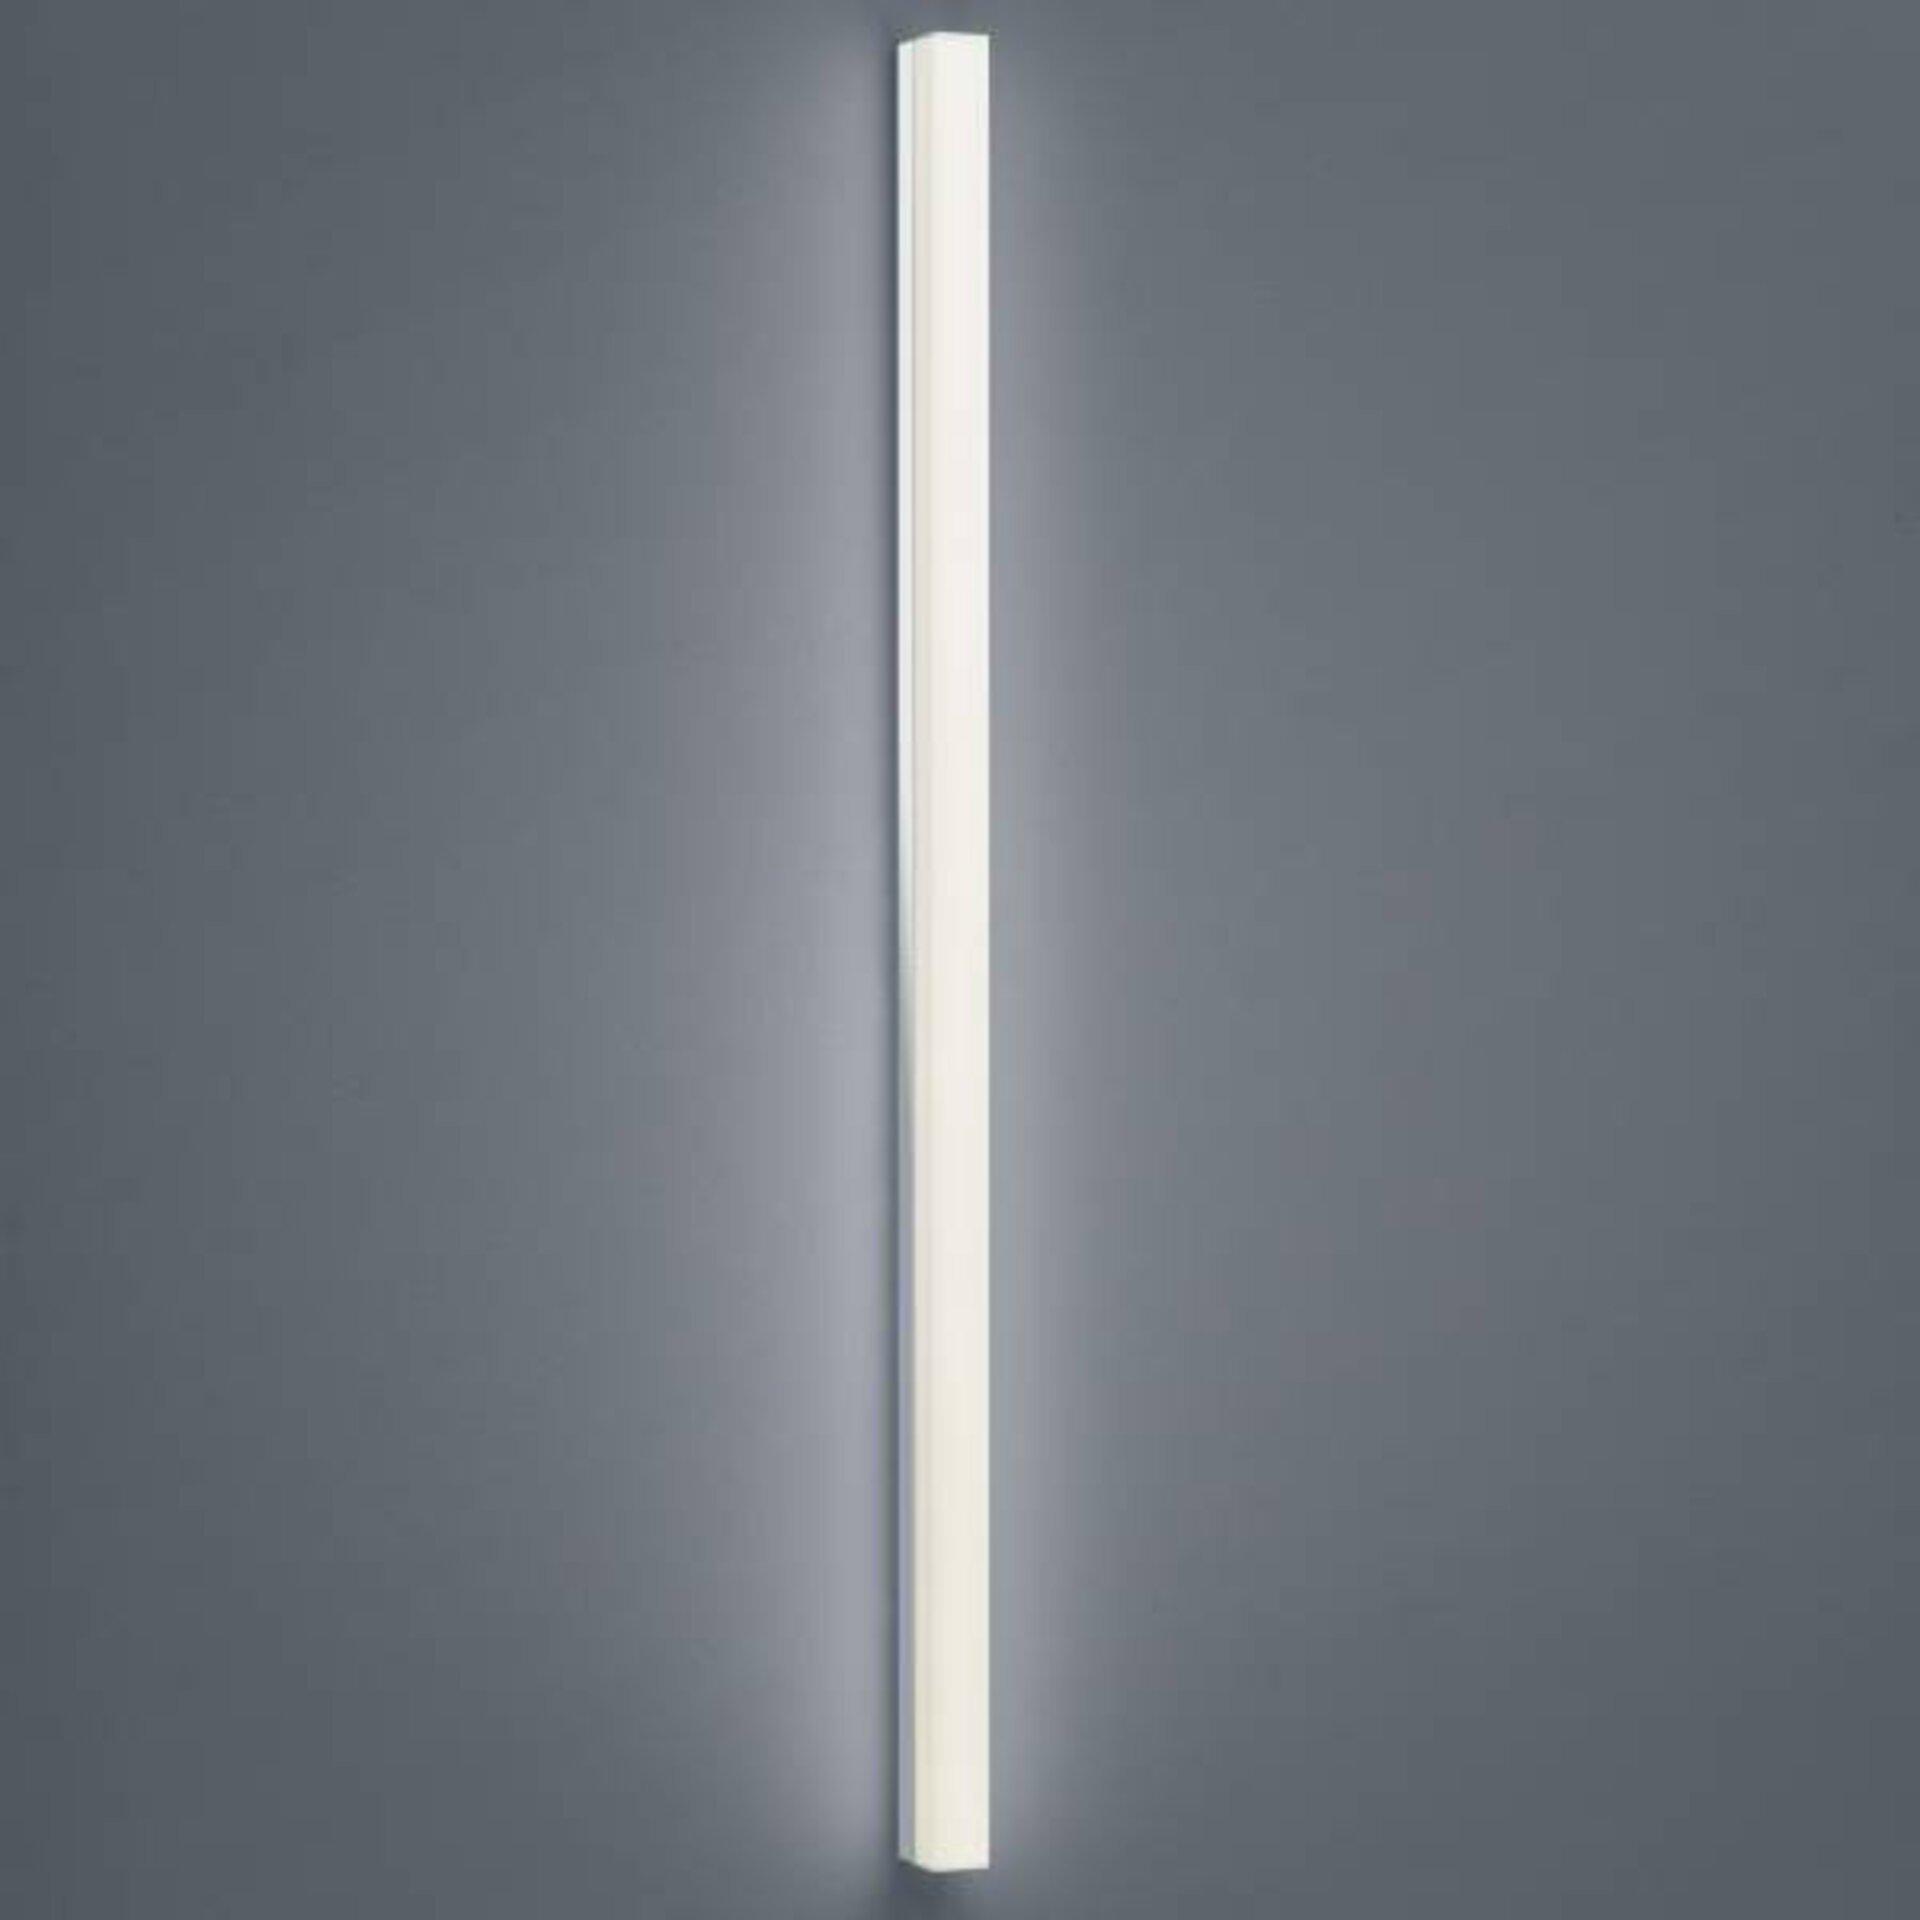 Bad-Wandleuchte LADO Helestra Leuchten Metall silber 4 x 6 x 120 cm